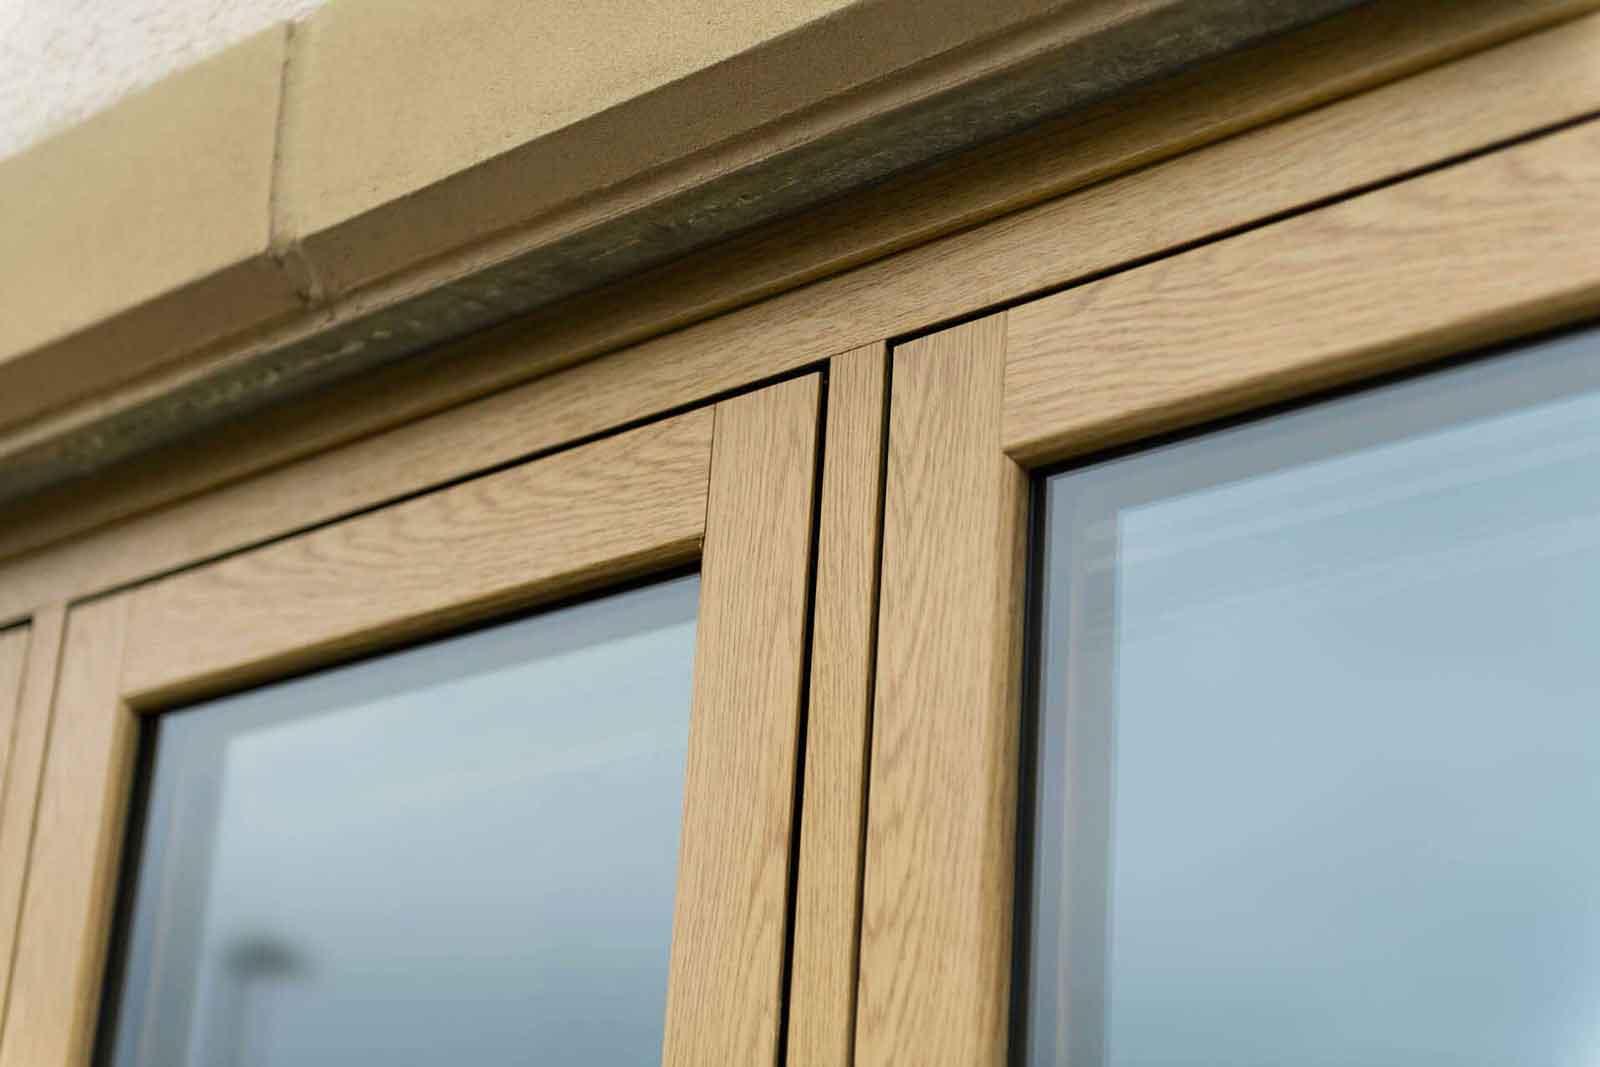 woodgrain effect windows hockley essex